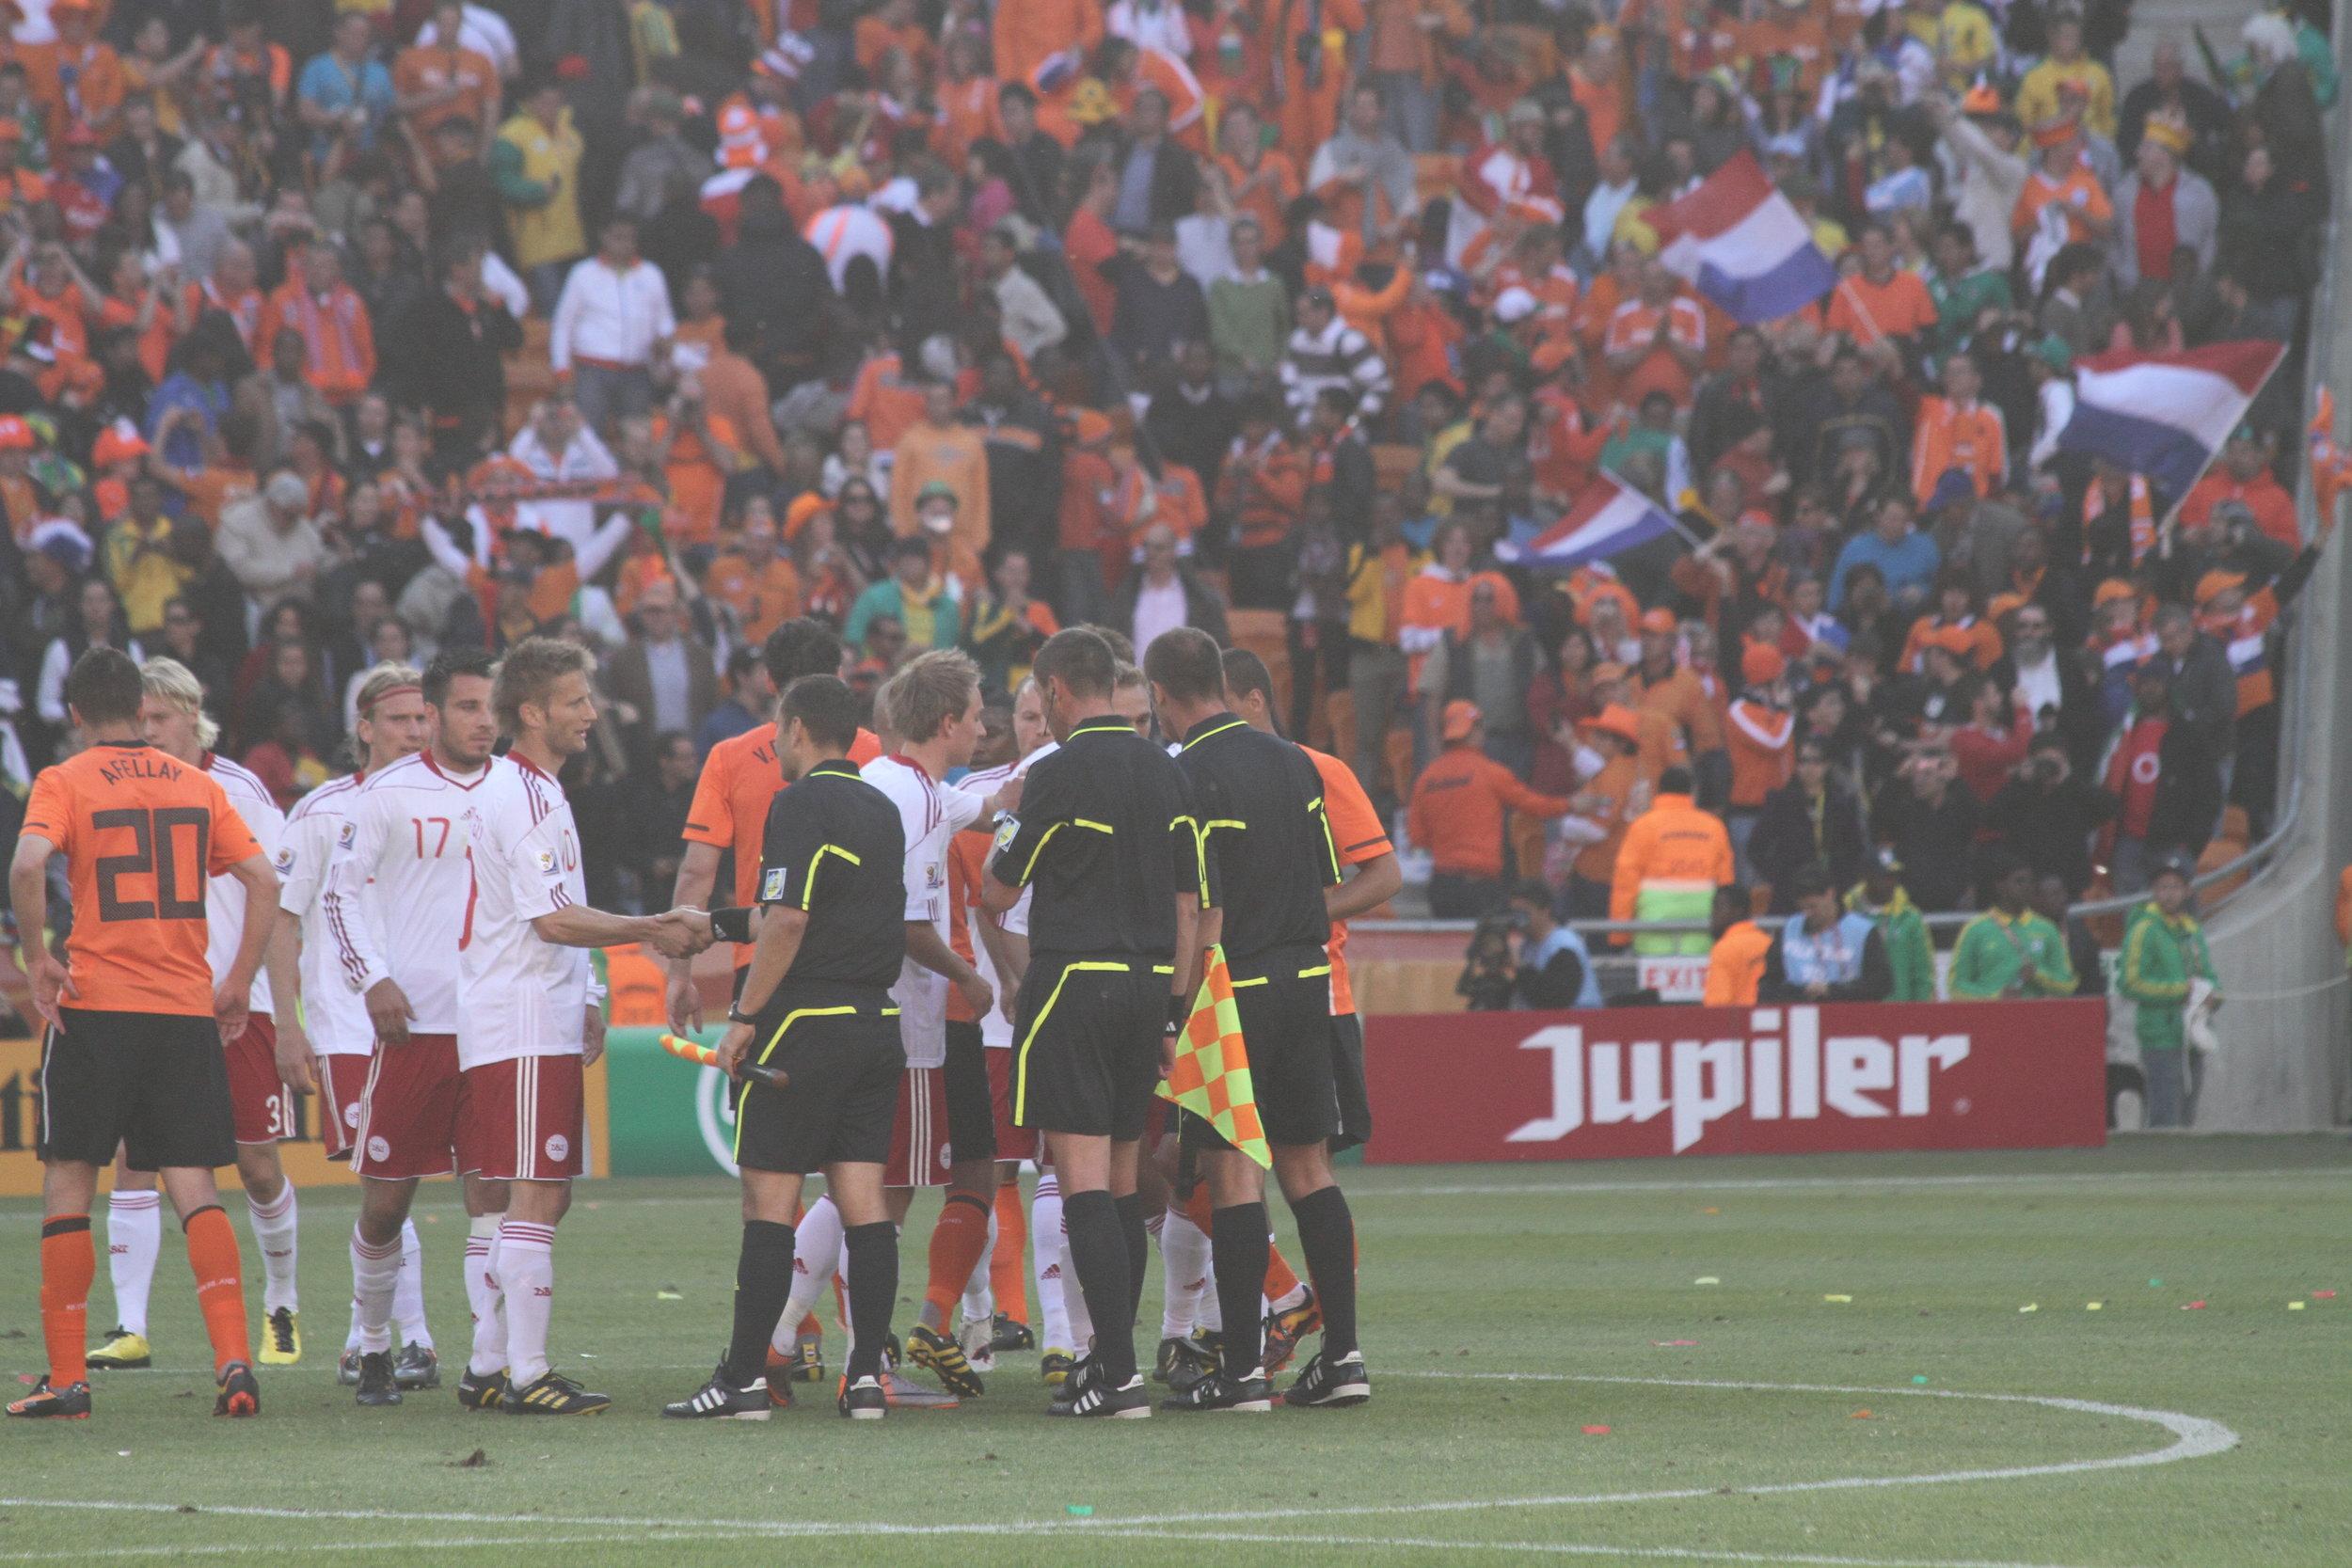 Final score: Netherlands 2 - Denmark 0